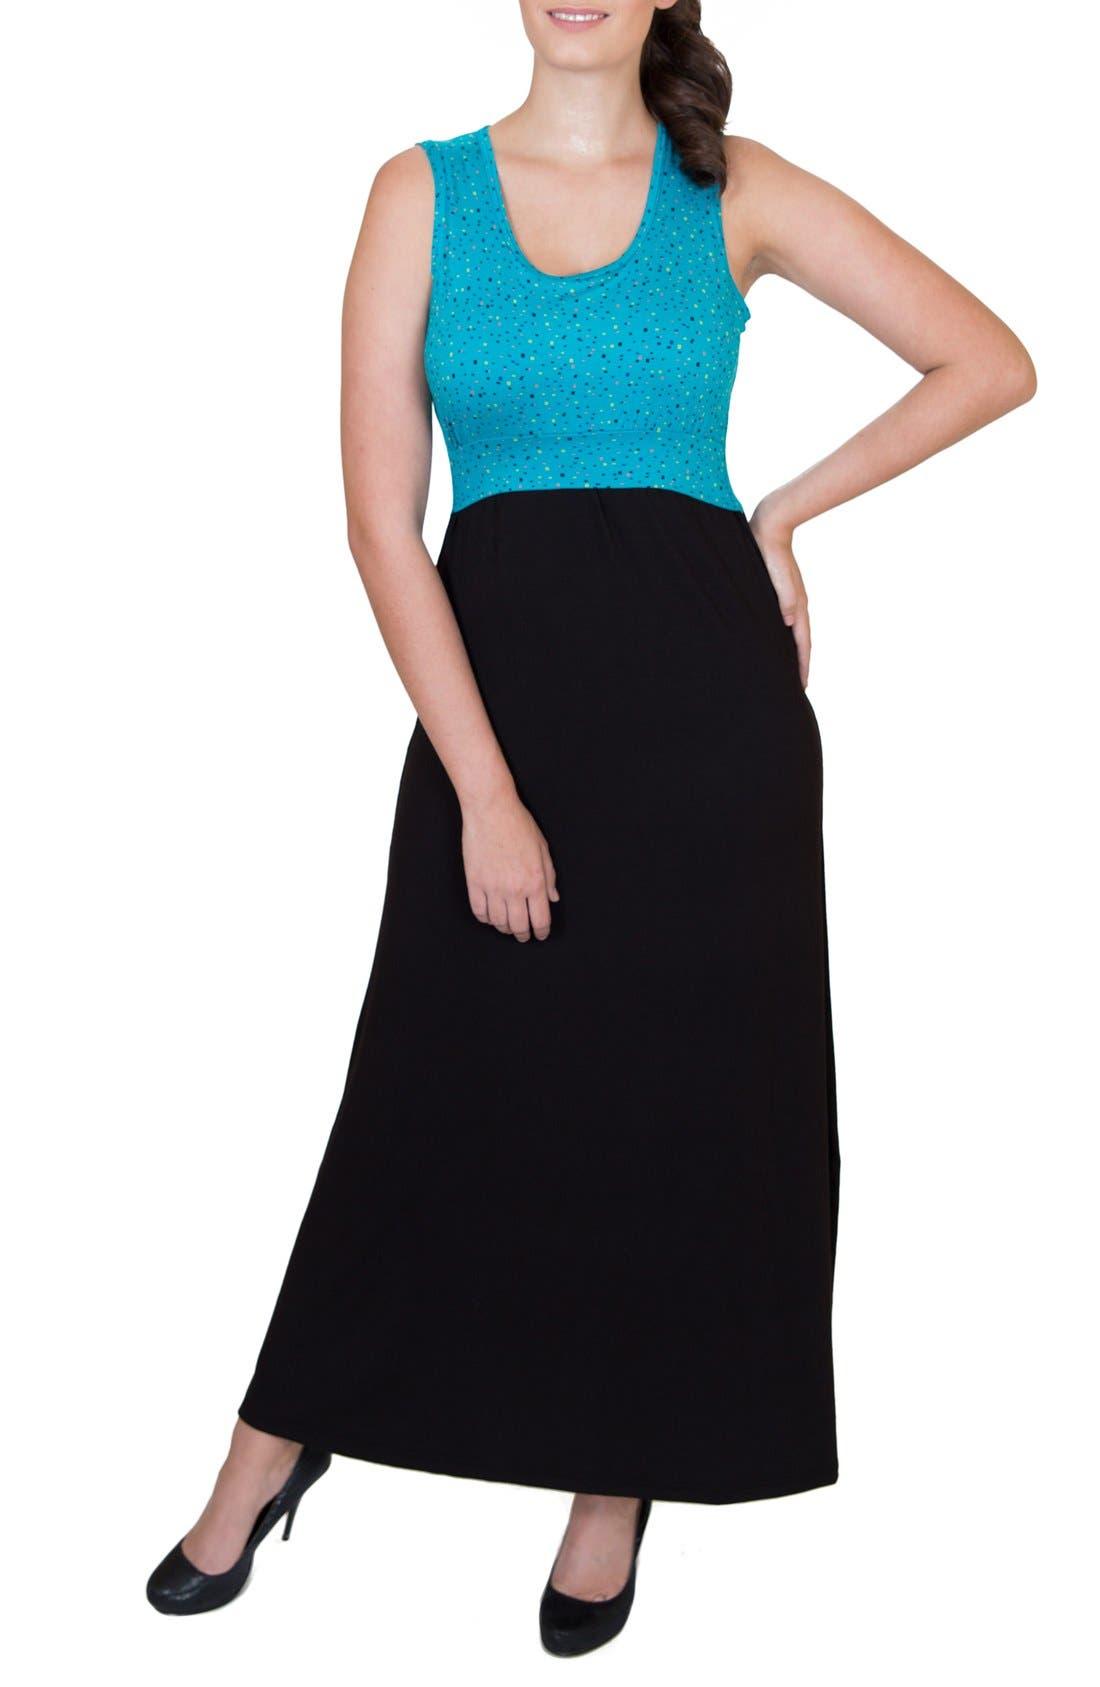 'Mariana' Maternity/Nursing Maxi Dress,                             Main thumbnail 1, color,                             DOTS TOP W/ BLACK SKIRT